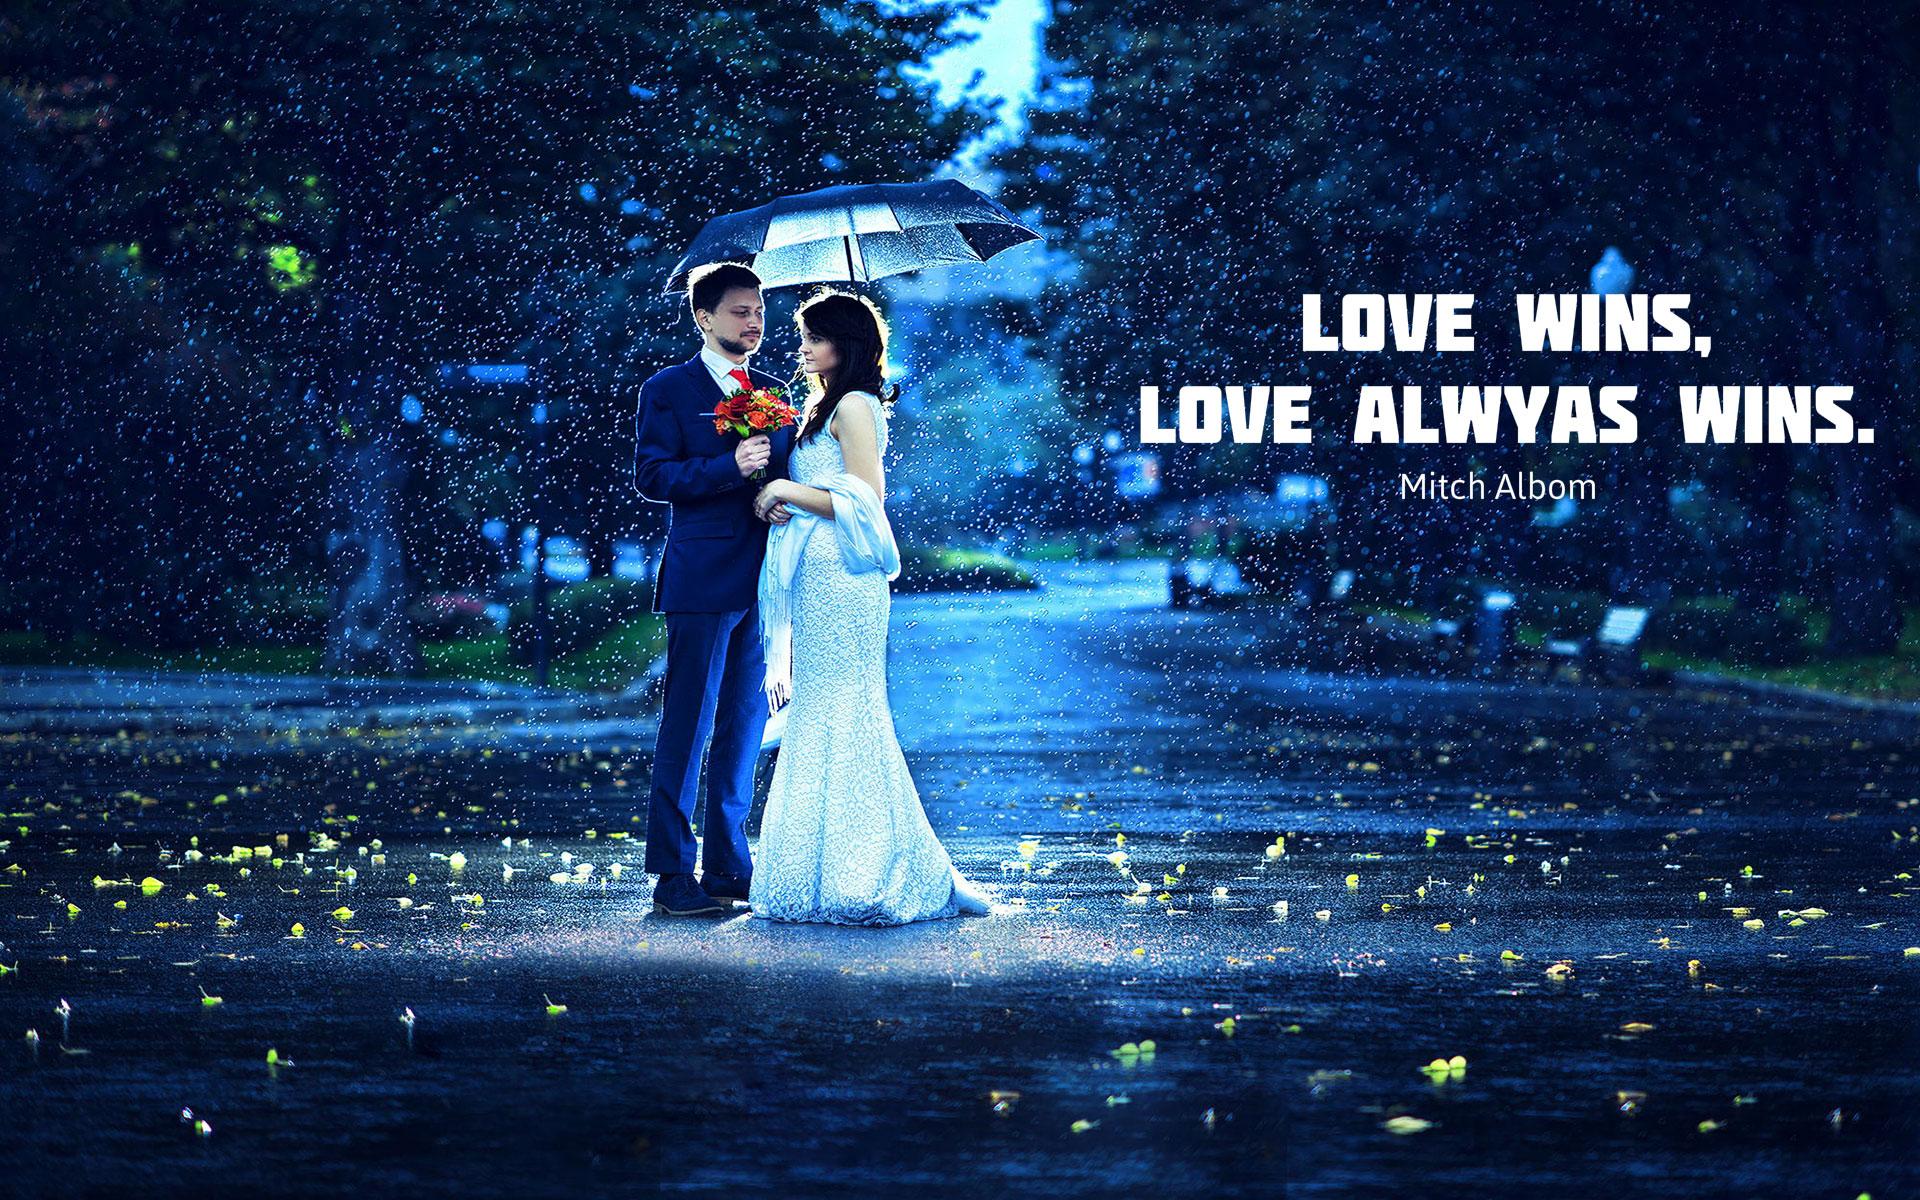 Love-wins-love-always-wins